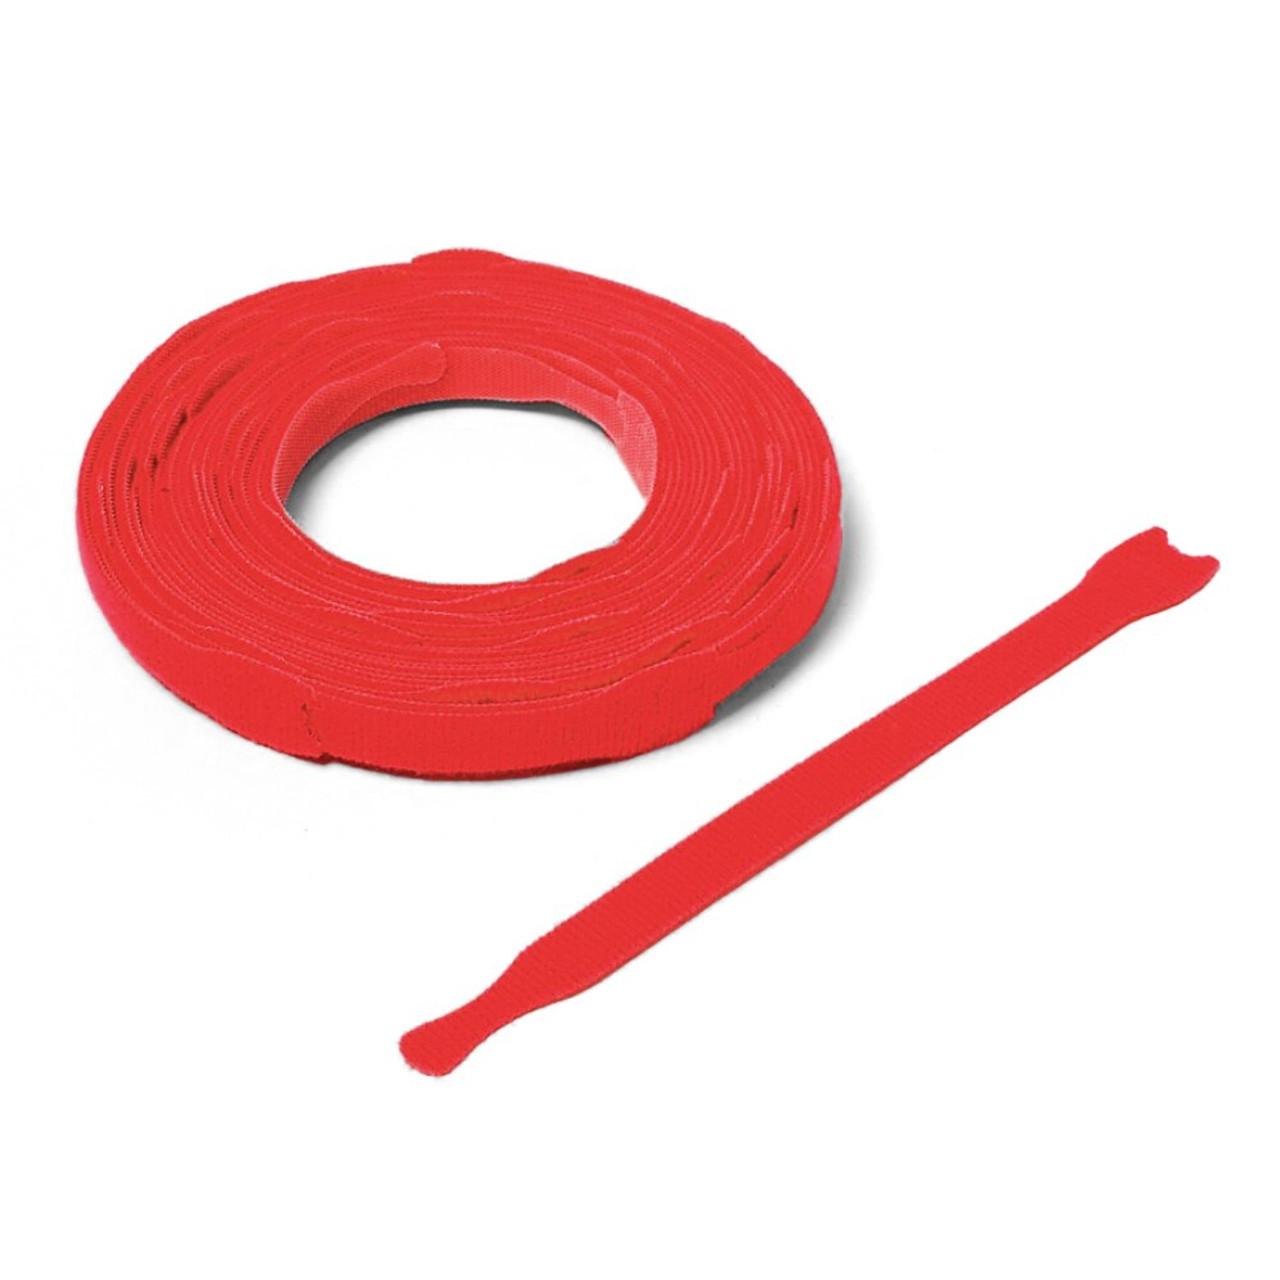 VELCRO ® Brand ONE-WRAP® Die-Cut Straps - Red